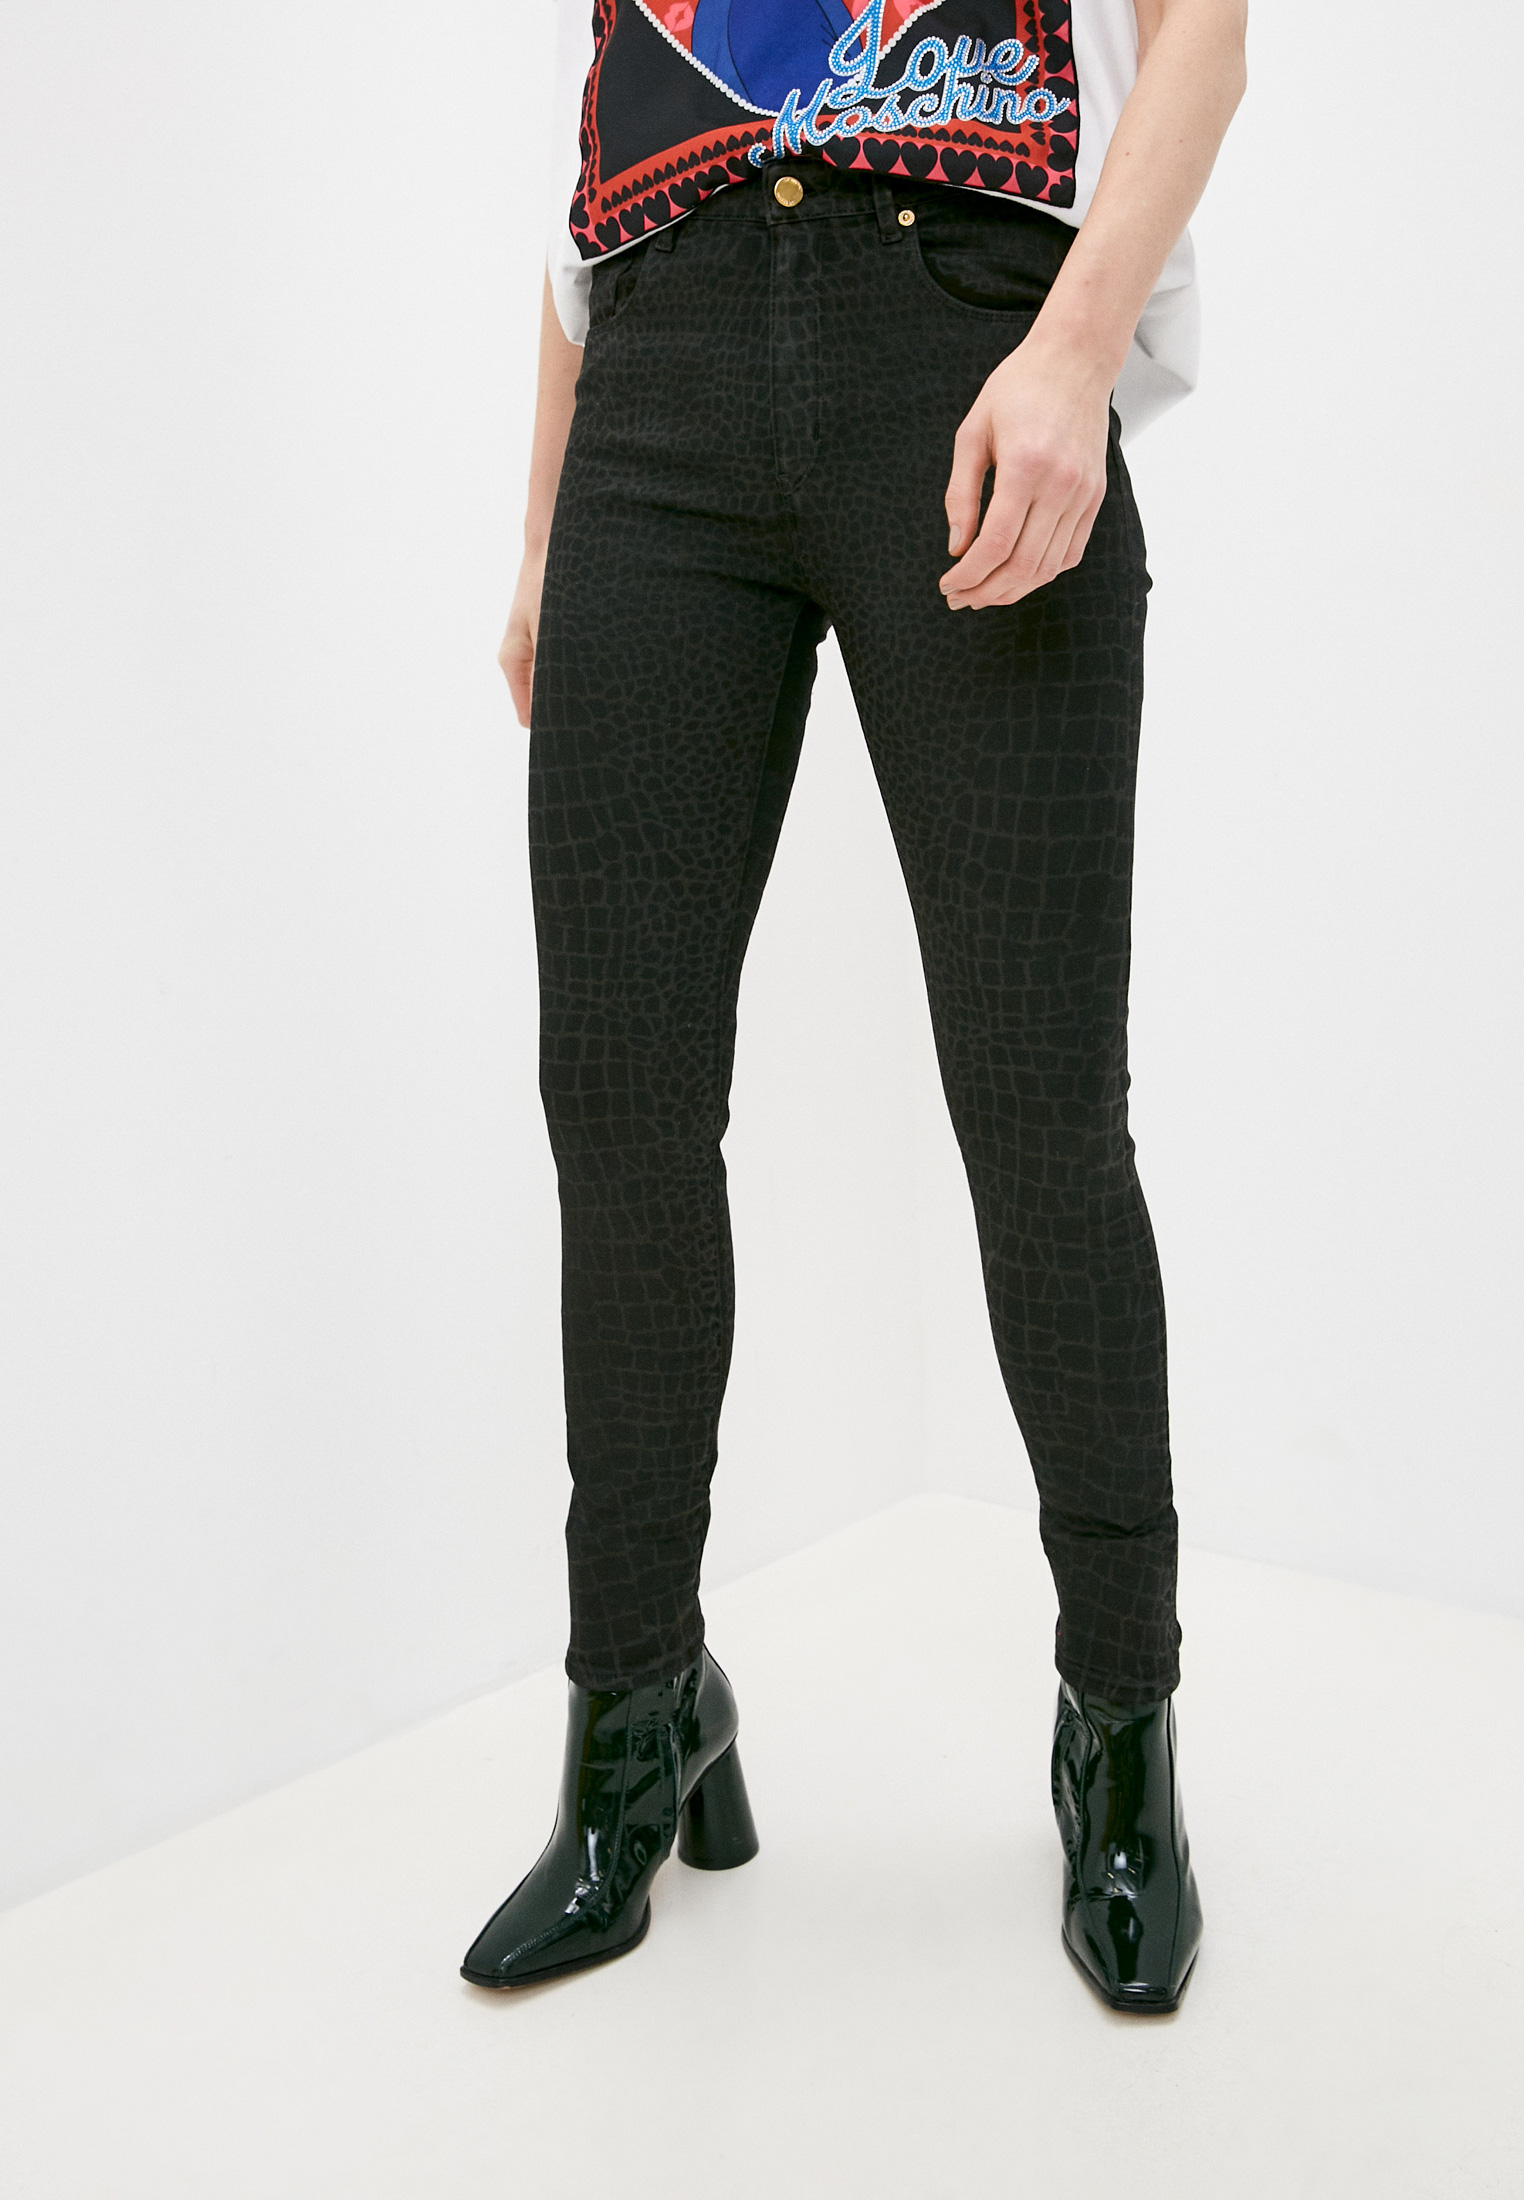 Зауженные джинсы Love Moschino W Q 436 80 S 3349